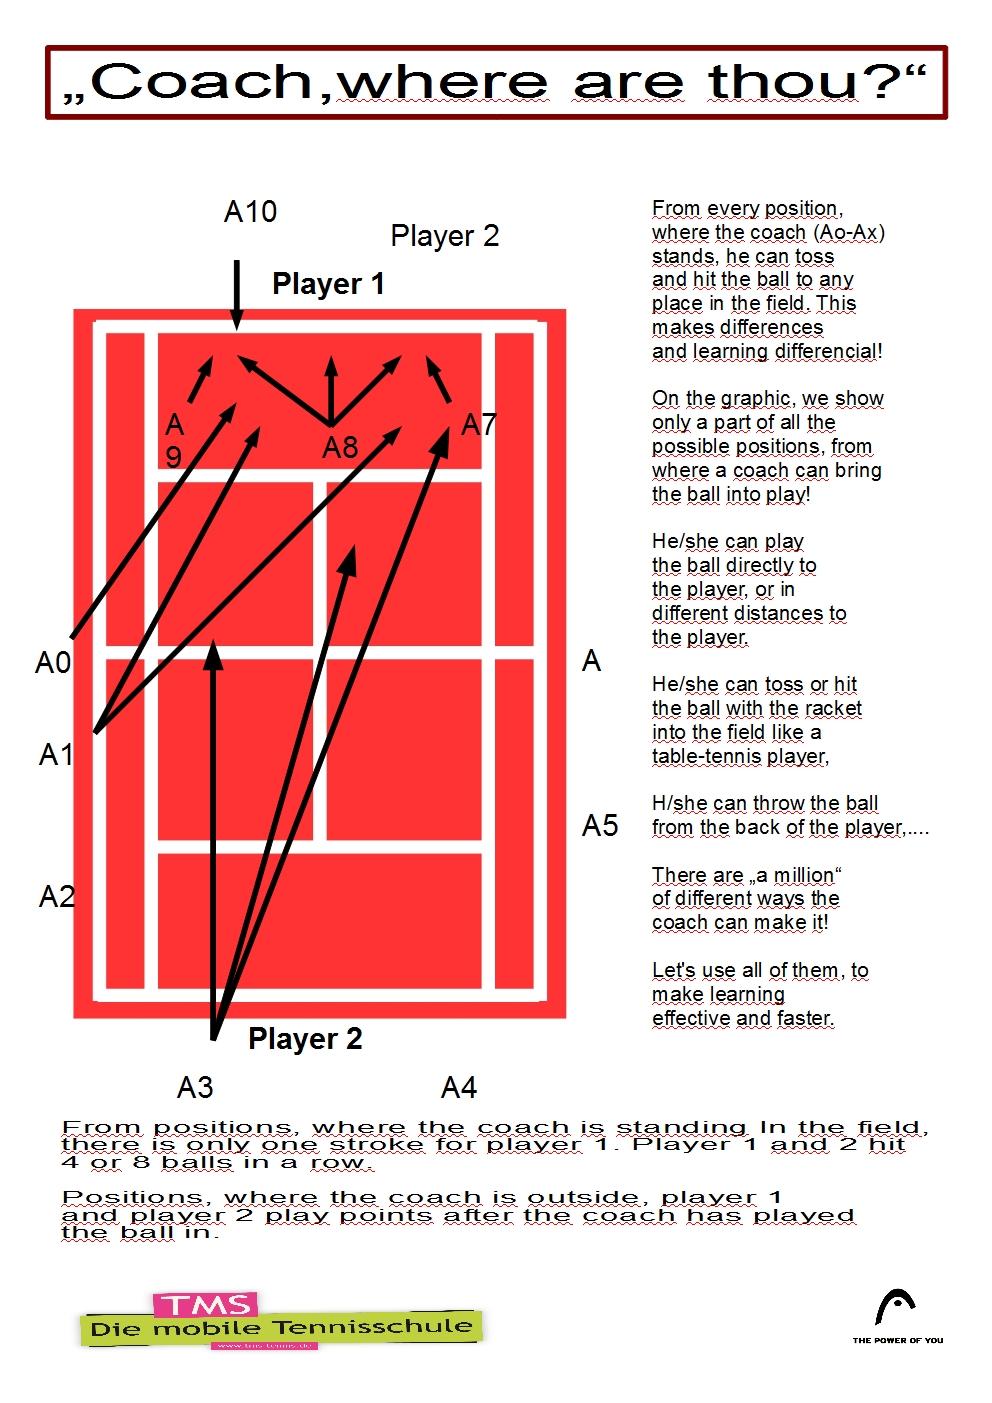 https://www.tms-tennis.de/inner-coaching/wp-content/uploads/2015/11/coach-where-are-thou.jpg